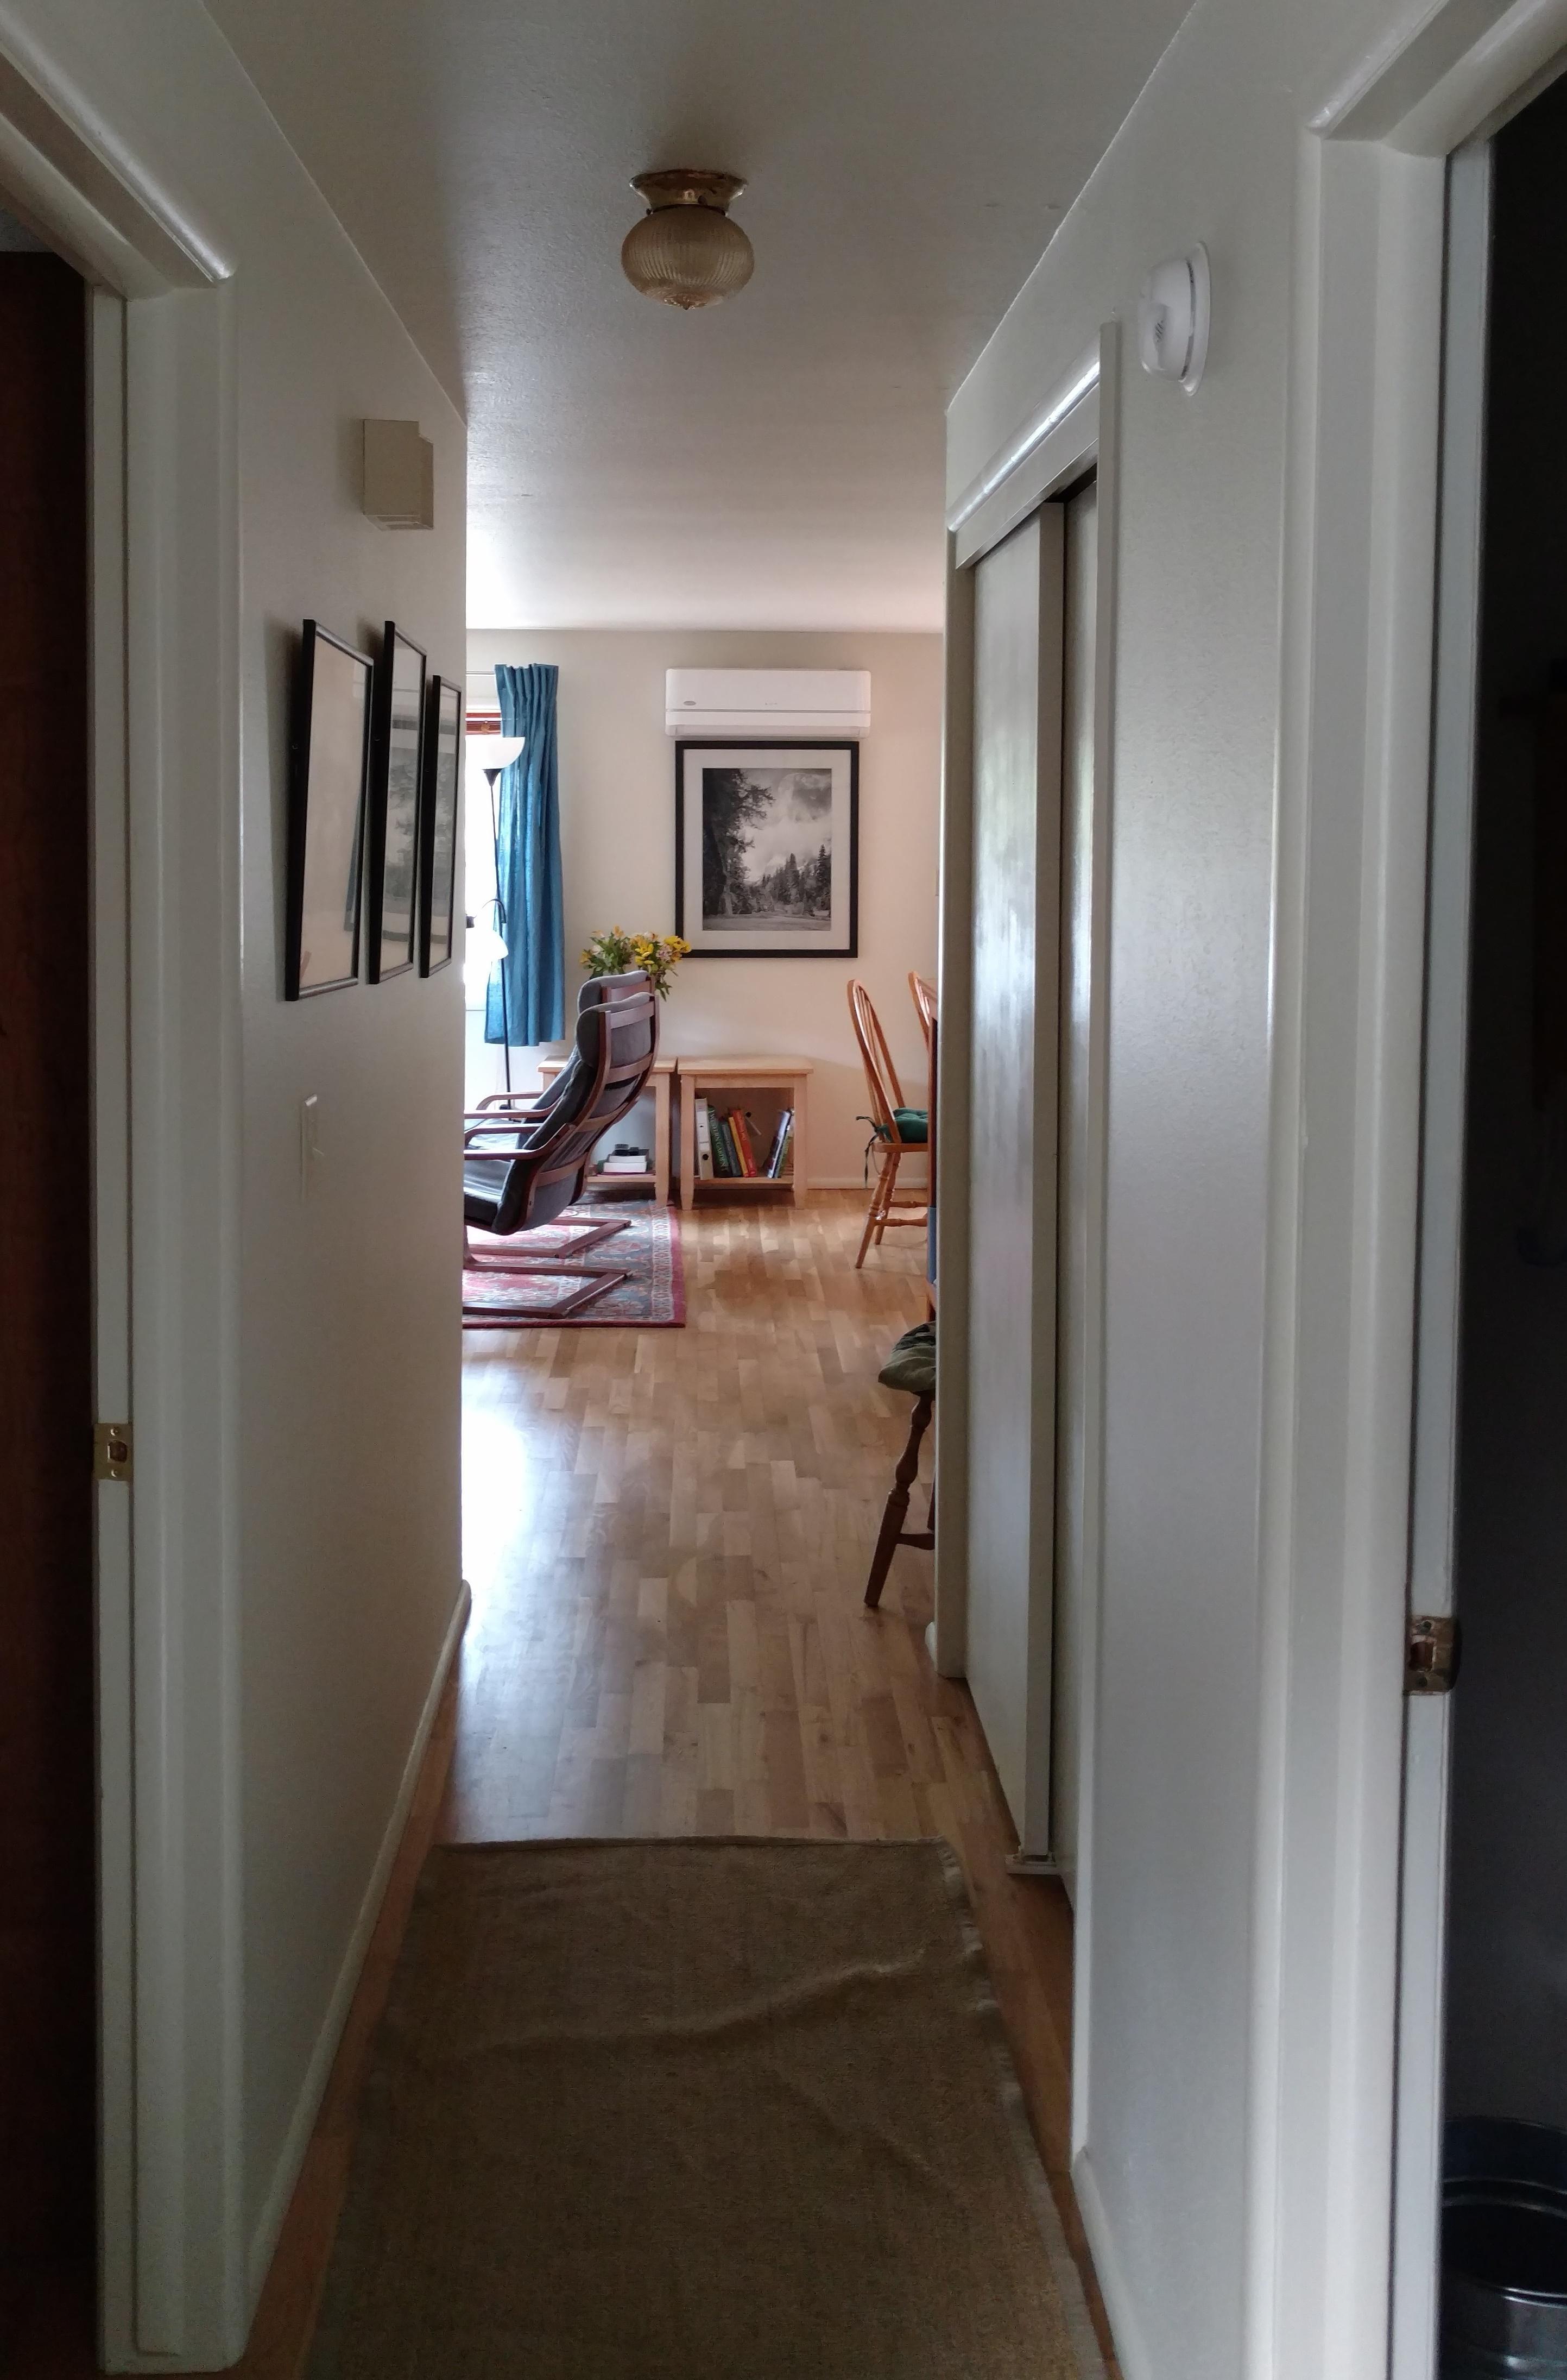 Charmantes Haus in lebhafter kleiner Stadt in Oregon, US-Westküste ...